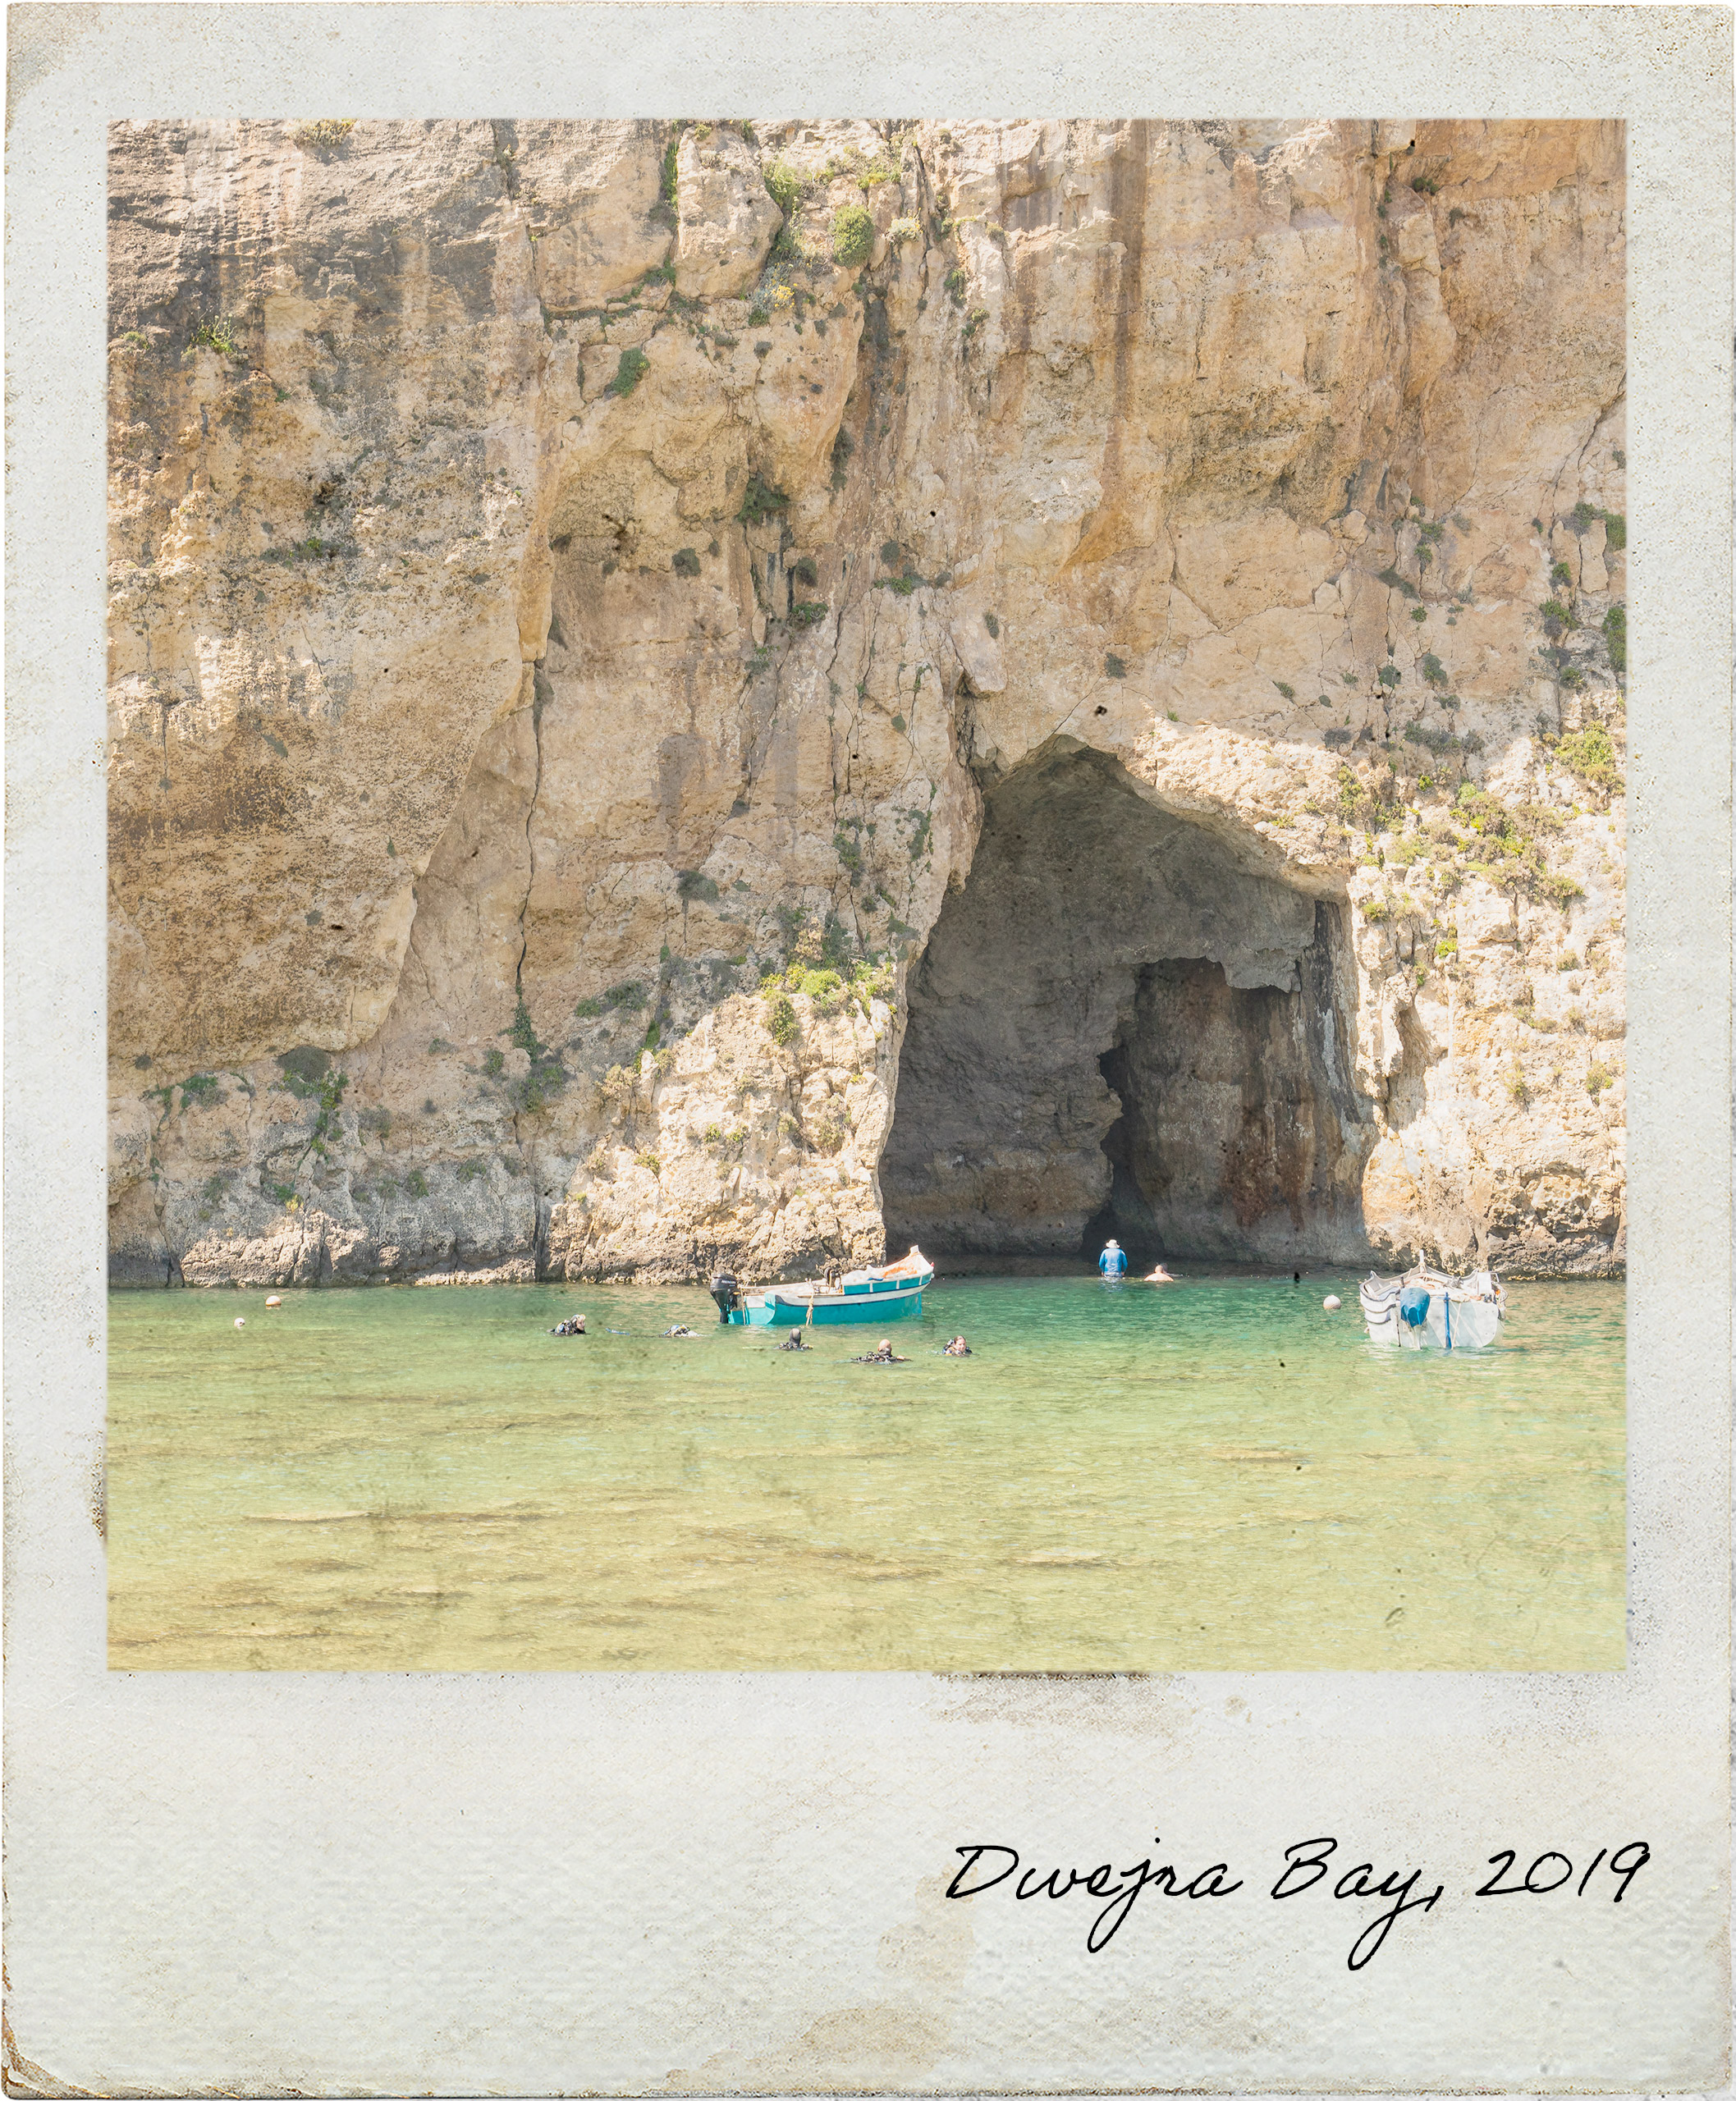 Passagem do mar epicontinental em Dwejra Bay